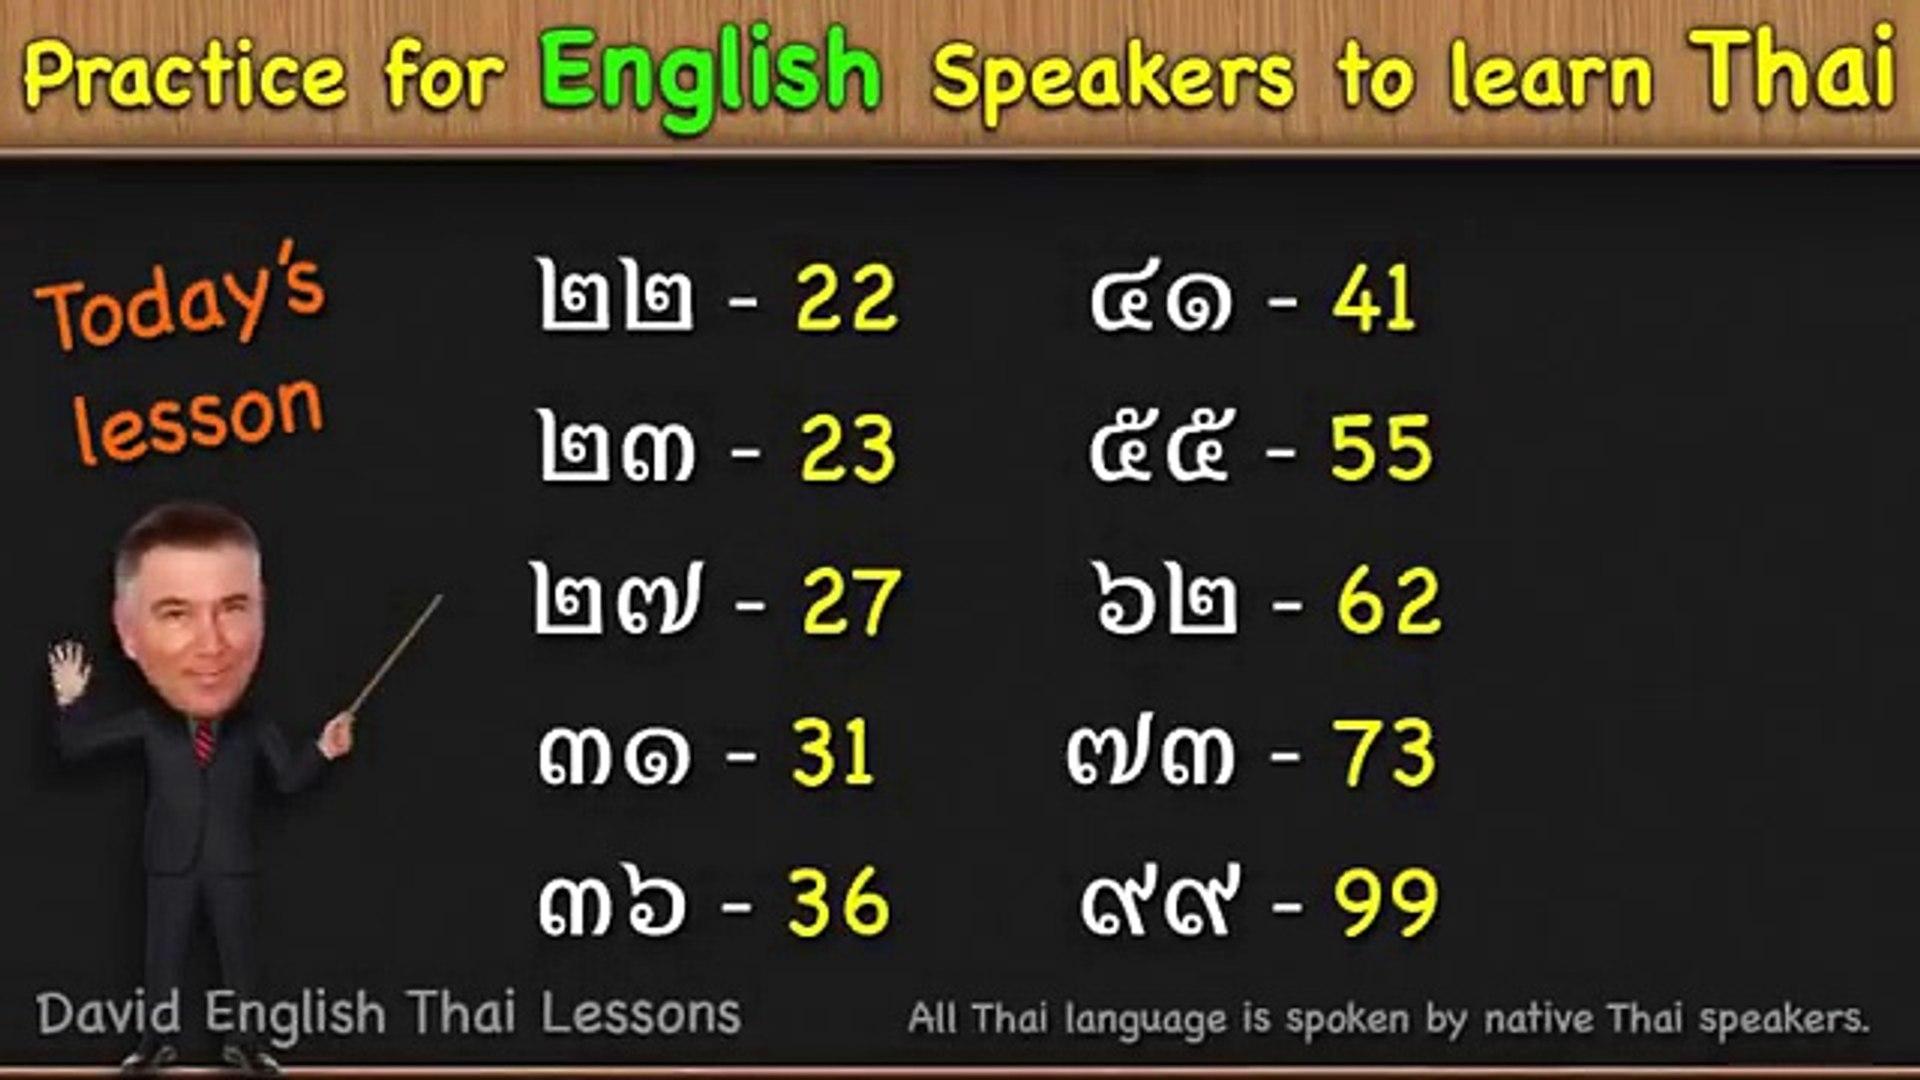 Thai Lesson 19 - Thai Numbers 22,23,27,31,36,41,55,62,73,99 - Learn Thai Numbers